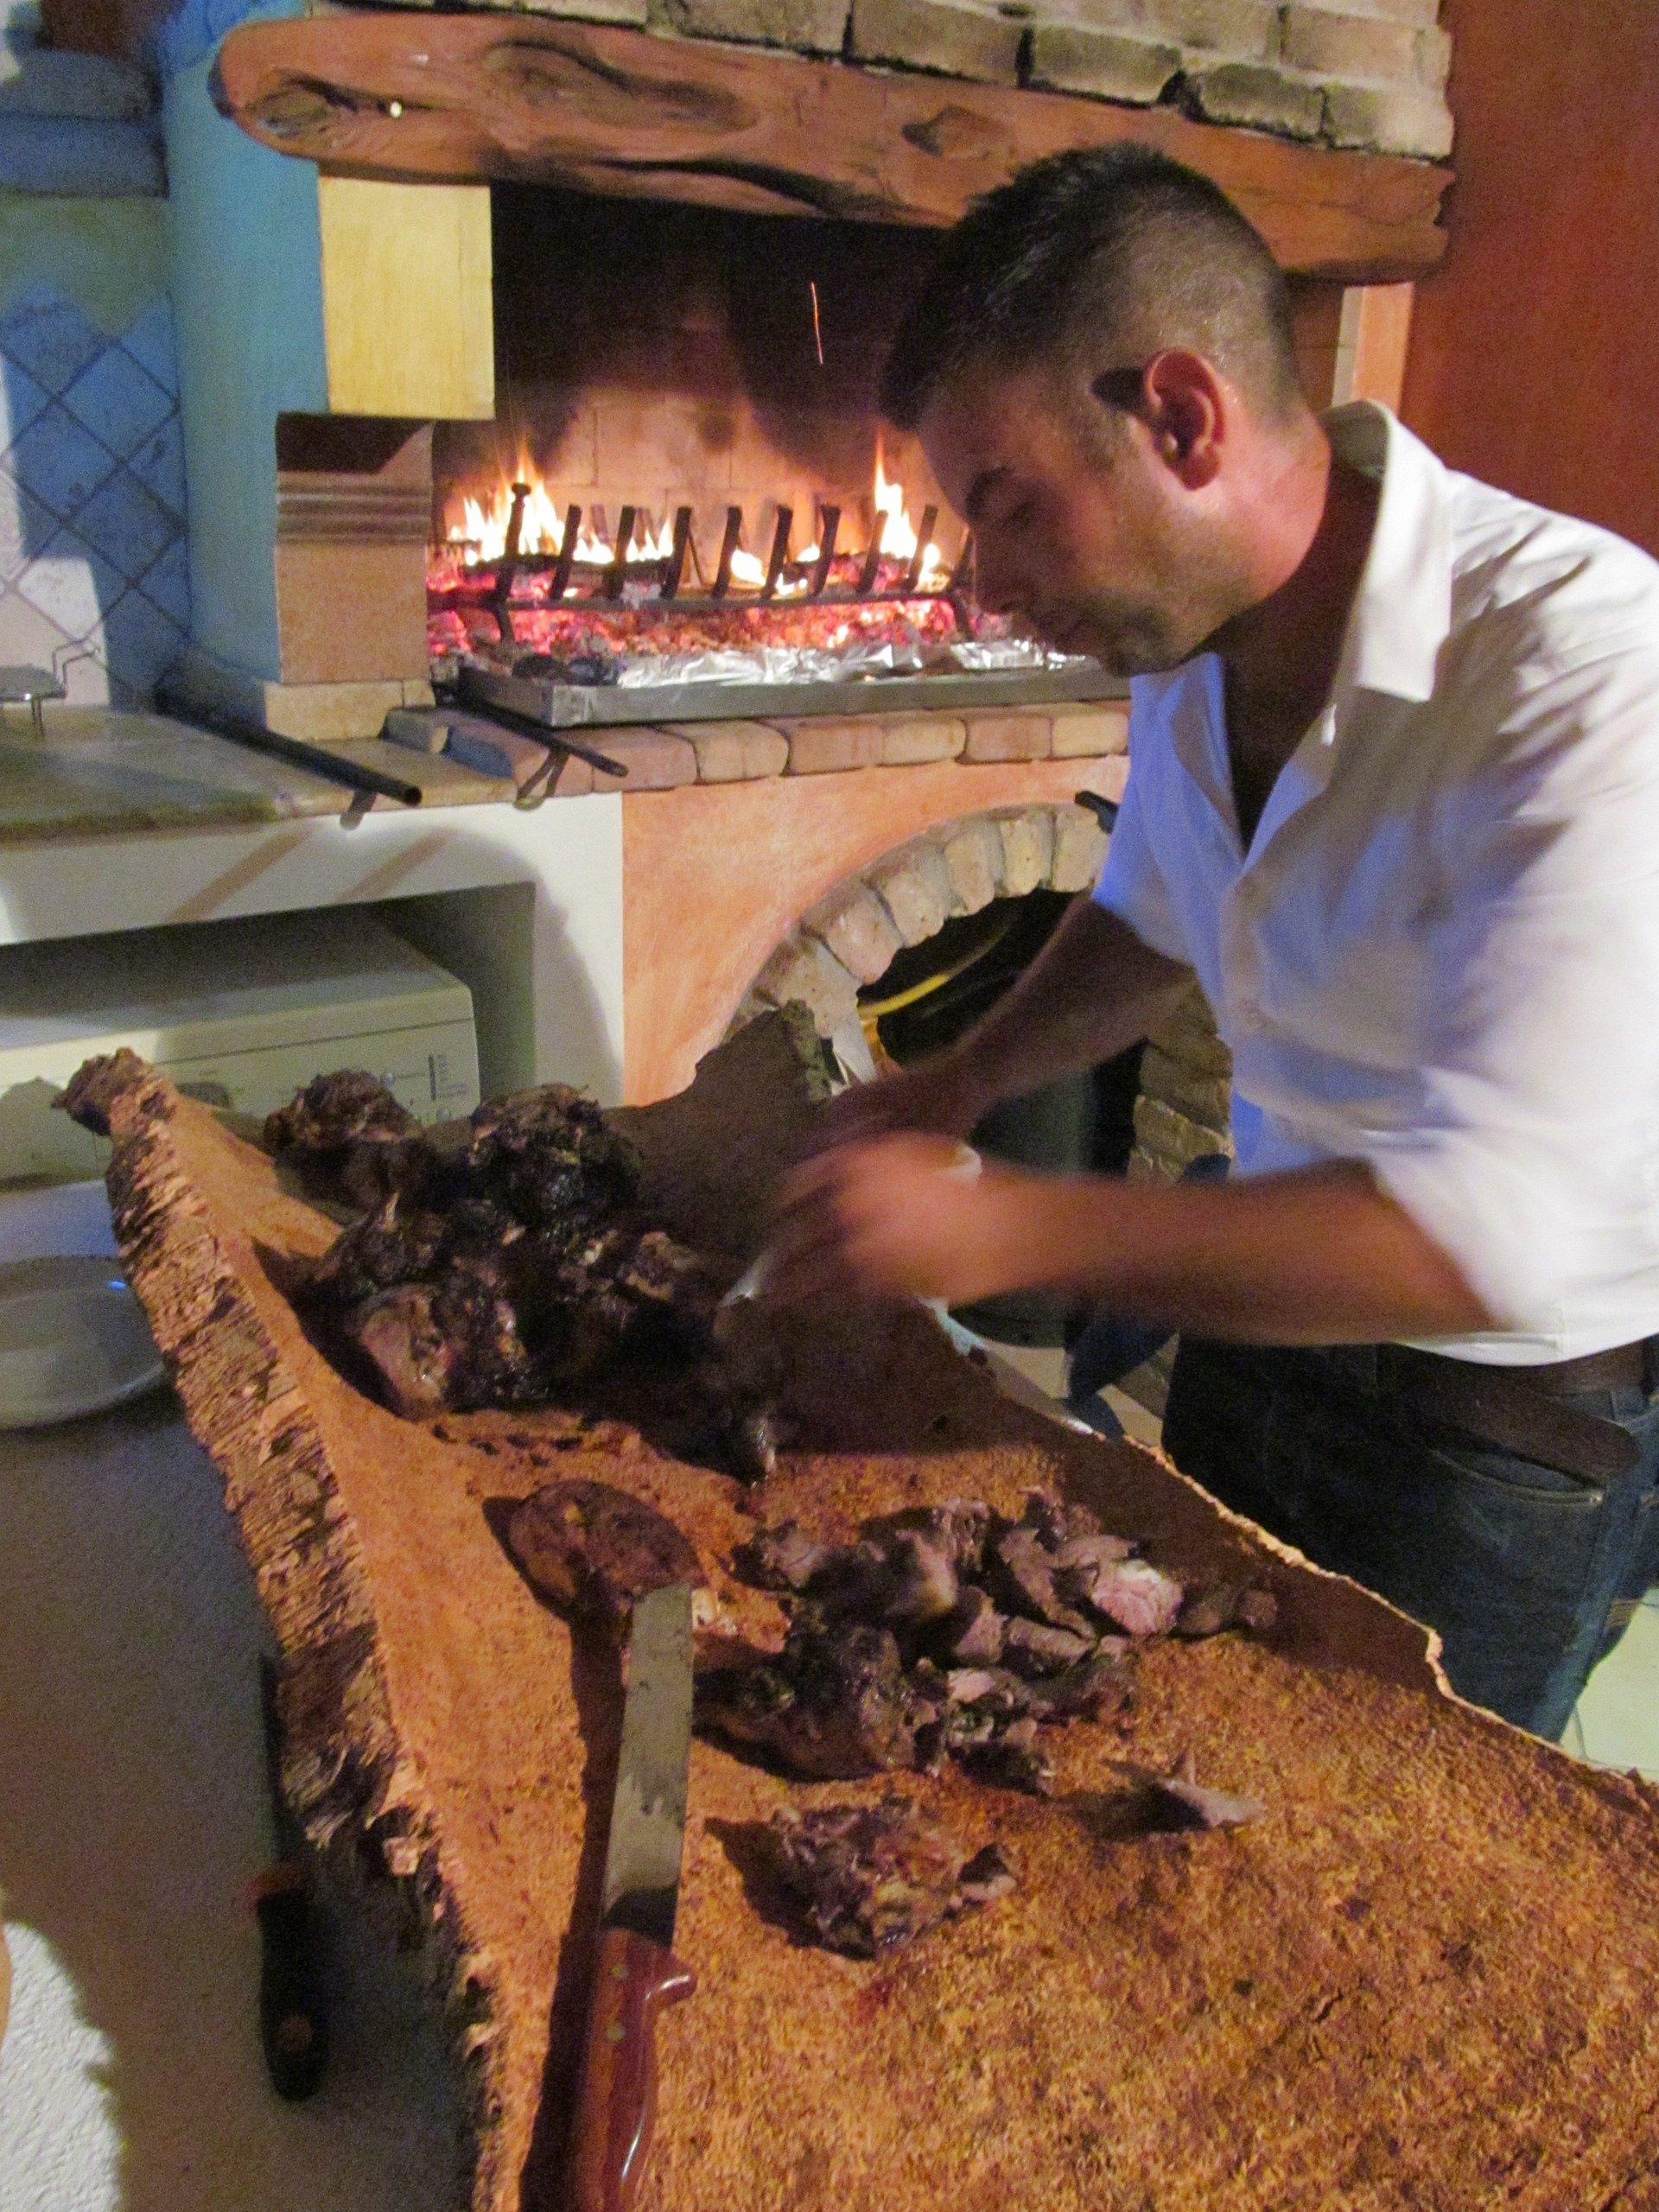 chef in una cucina mentre taglia carne